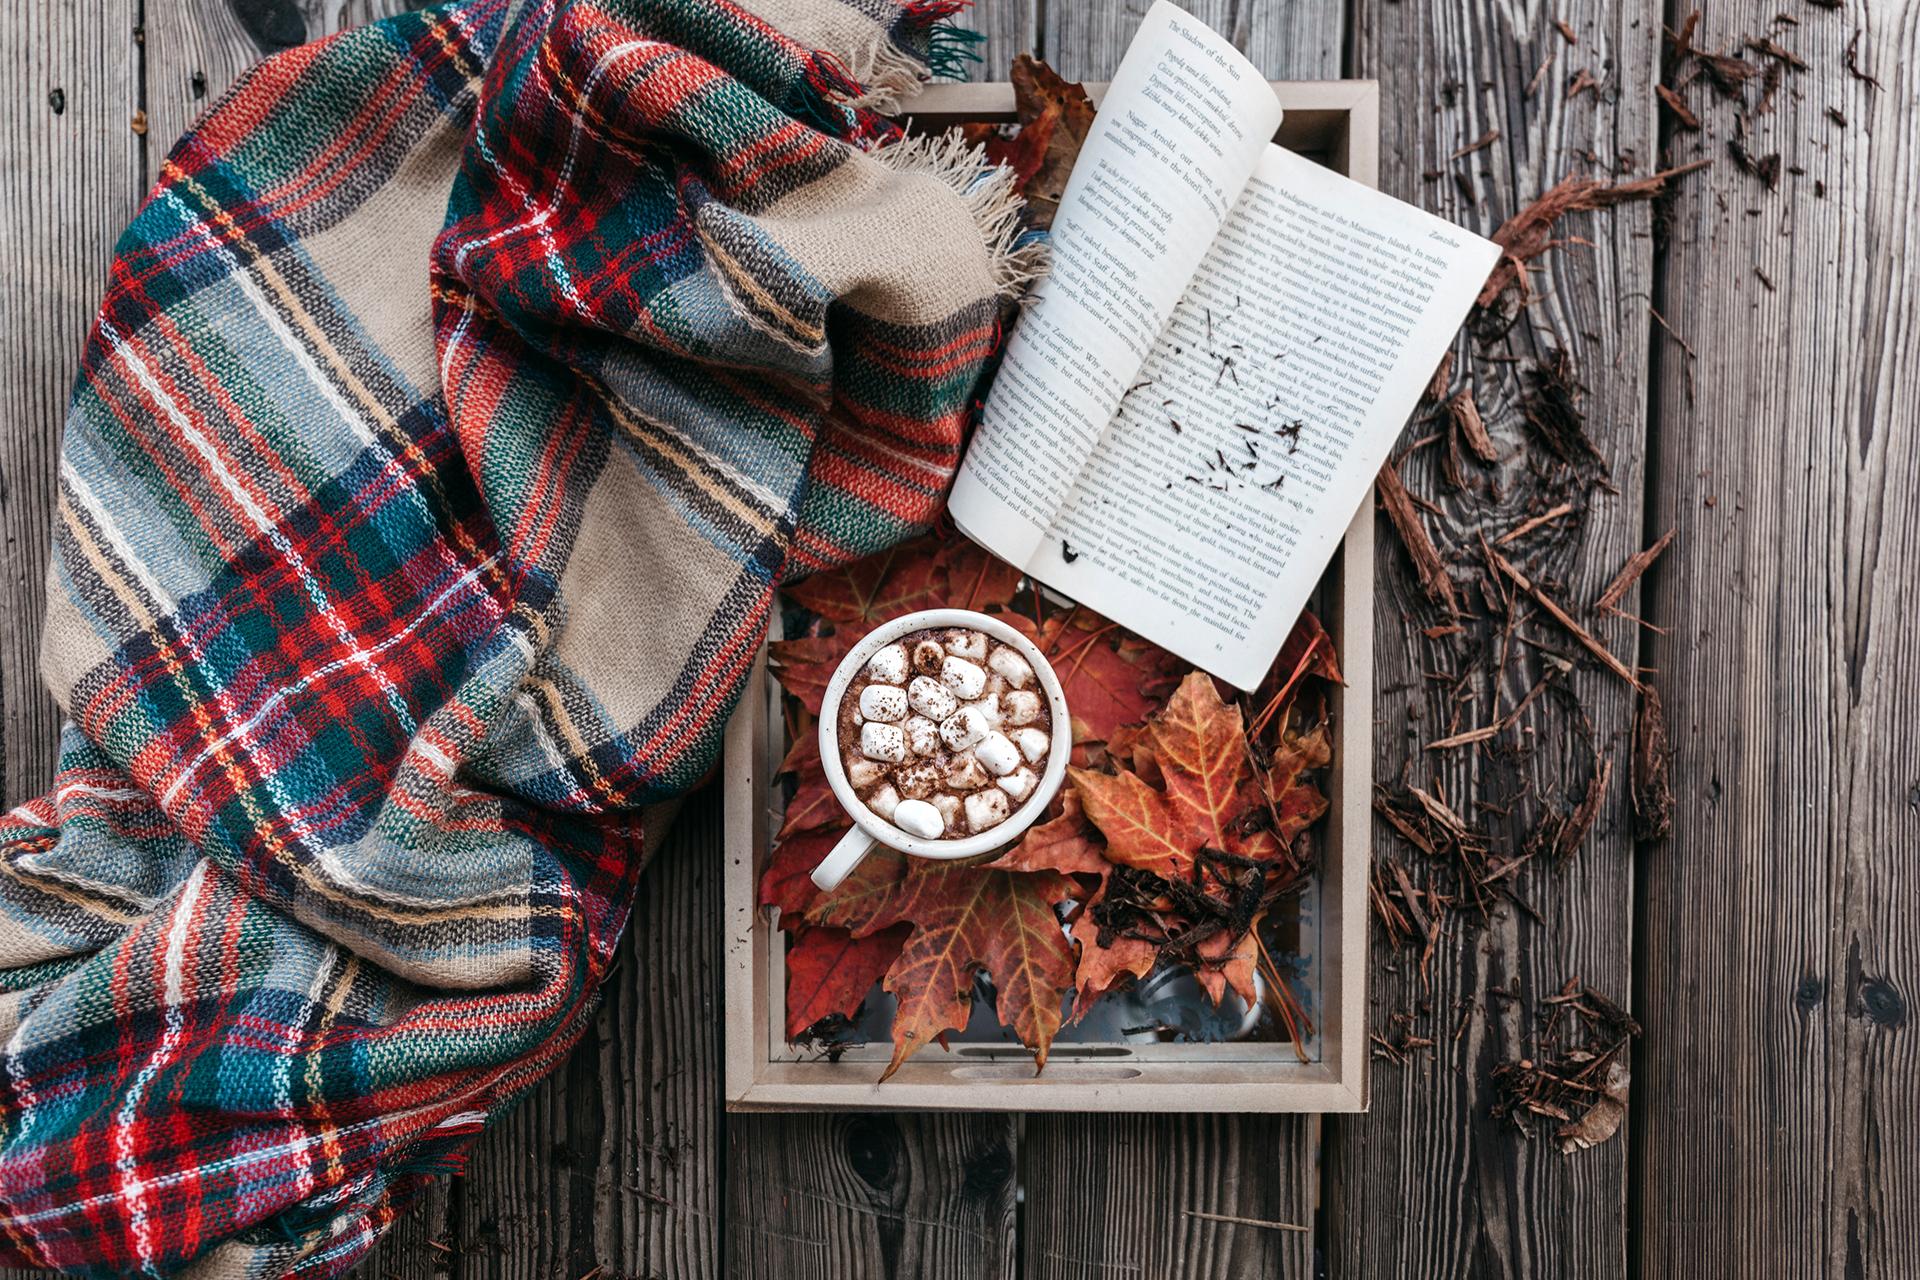 Gerade im Winter ist Hot Tonka Chocolate als wärmendes Getränk beliebt